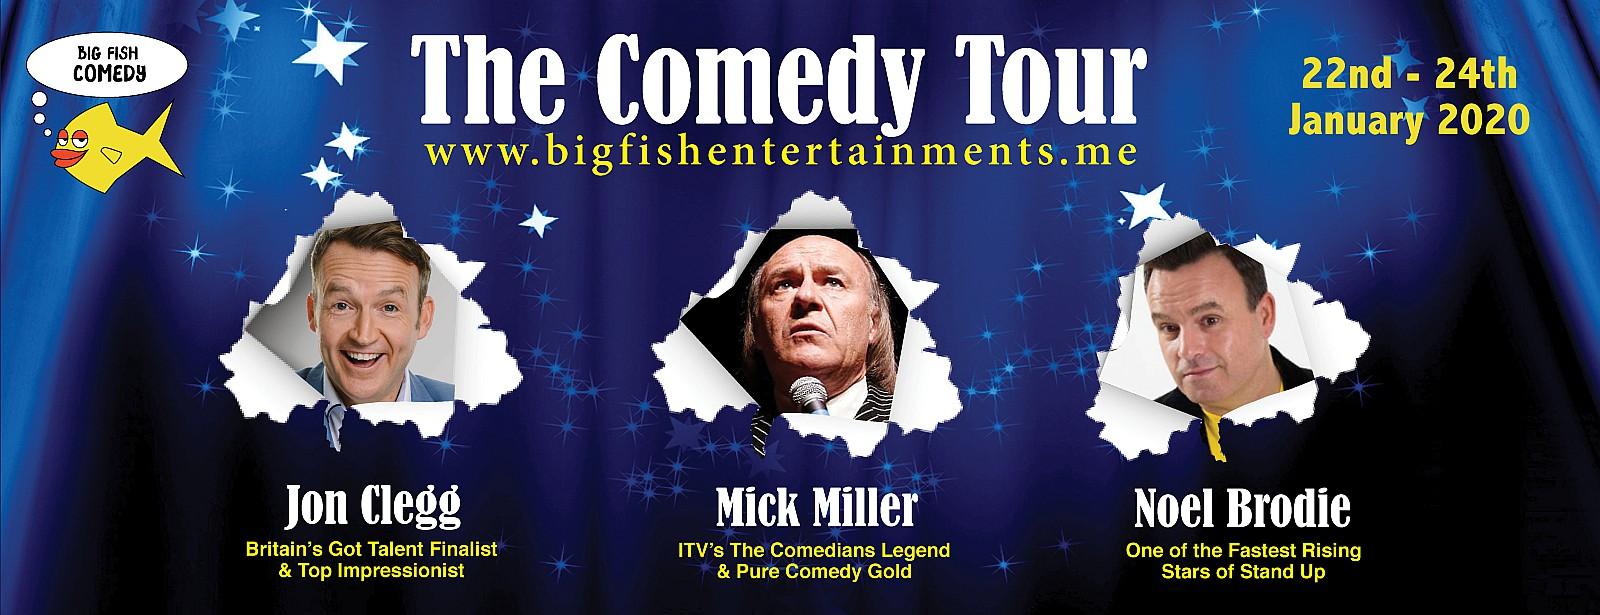 Big Fish Comedy Tour on Jan 22nd – 24th at Mövenpick Hotel Jumeirah Beach Dubai